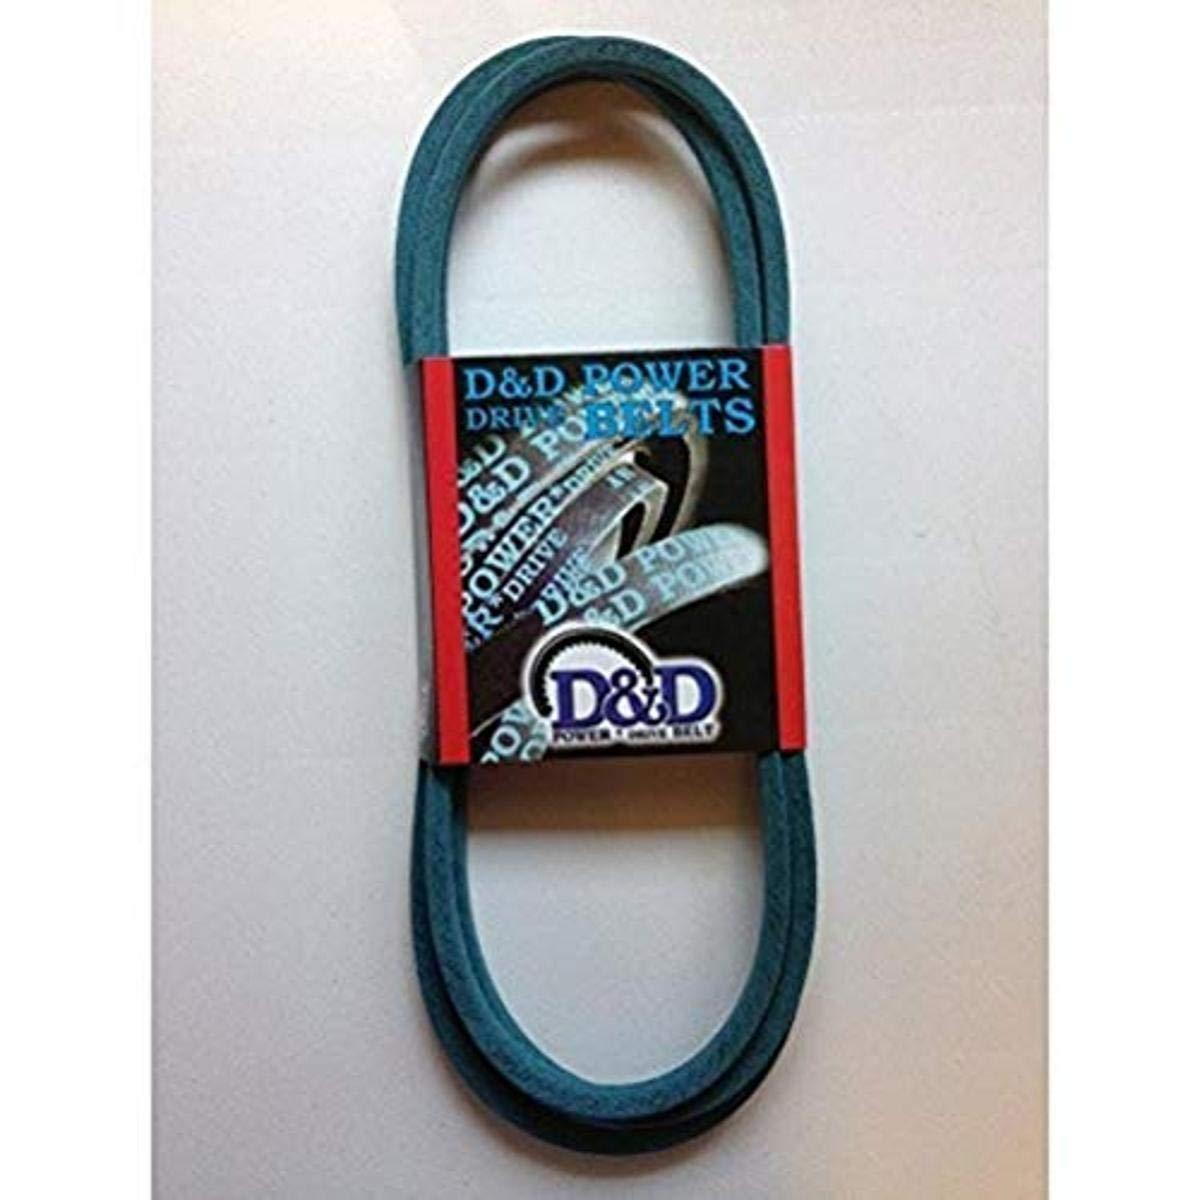 D&D PowerDrive 111710 Montgomery Ward Kevlar Replacement Belt, 1 Band, Aramid